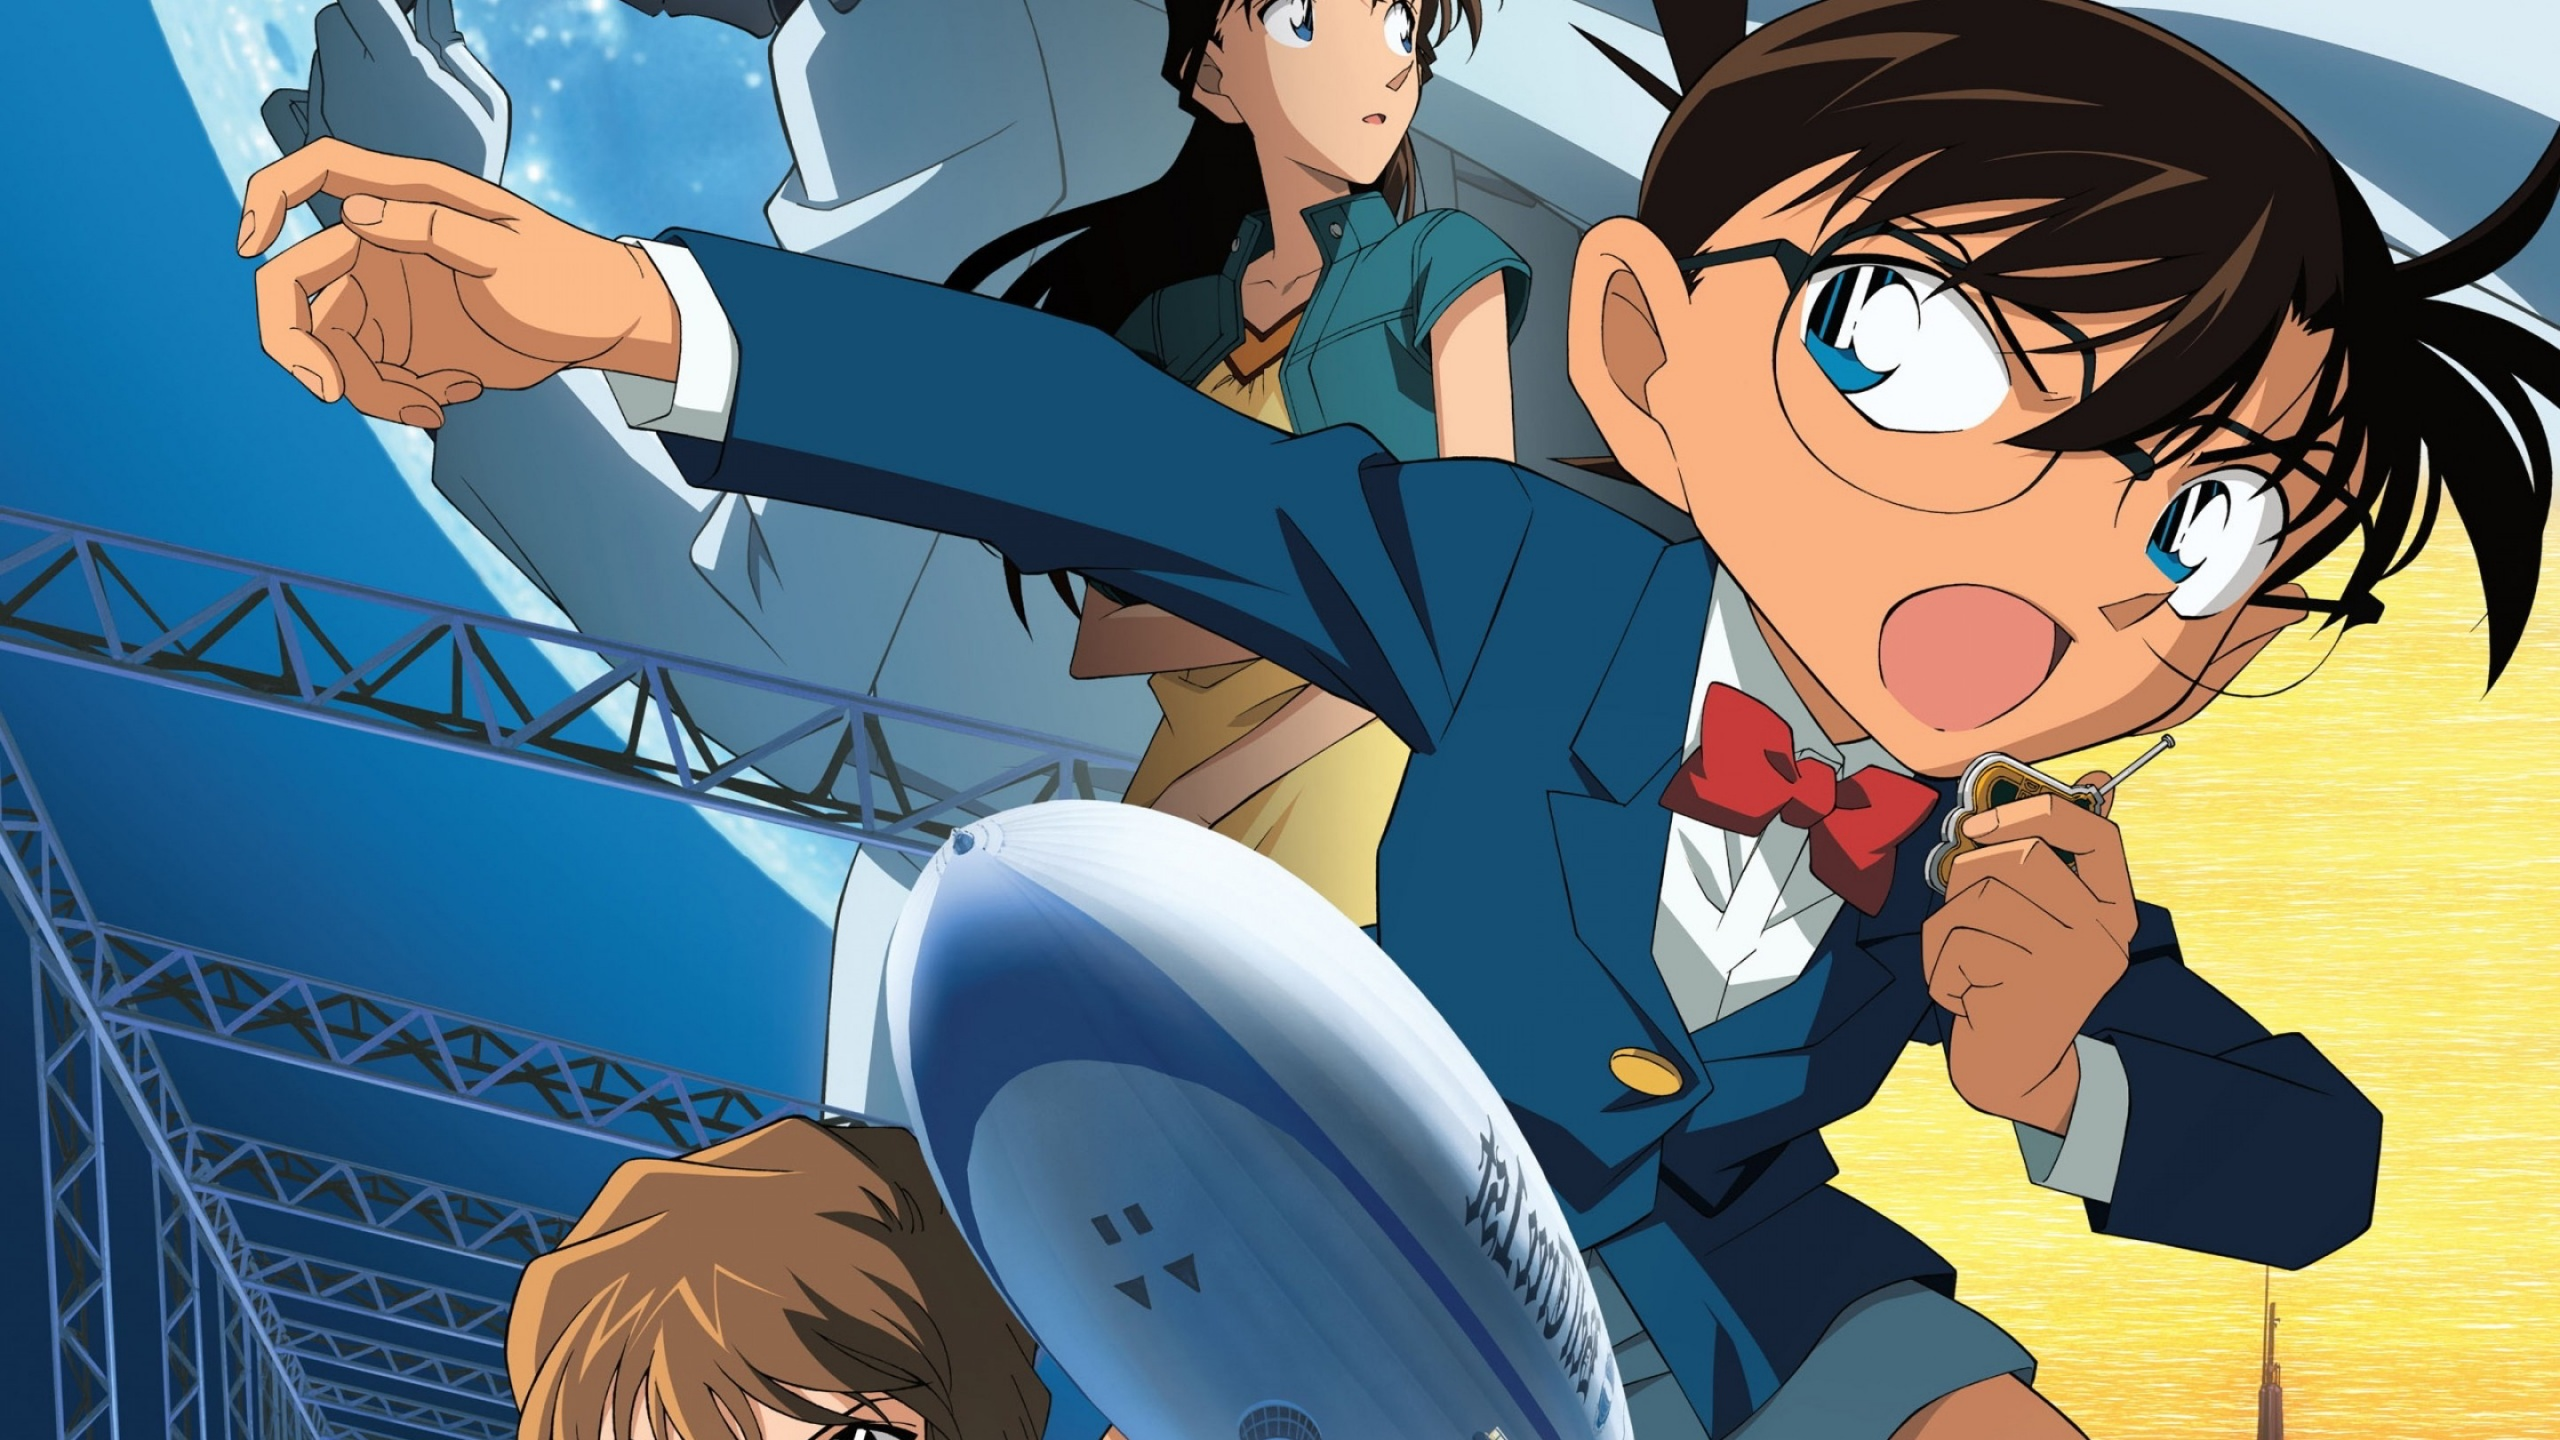 Download Detective Conan Wallpapers Hd 2560x1440 73 Detective